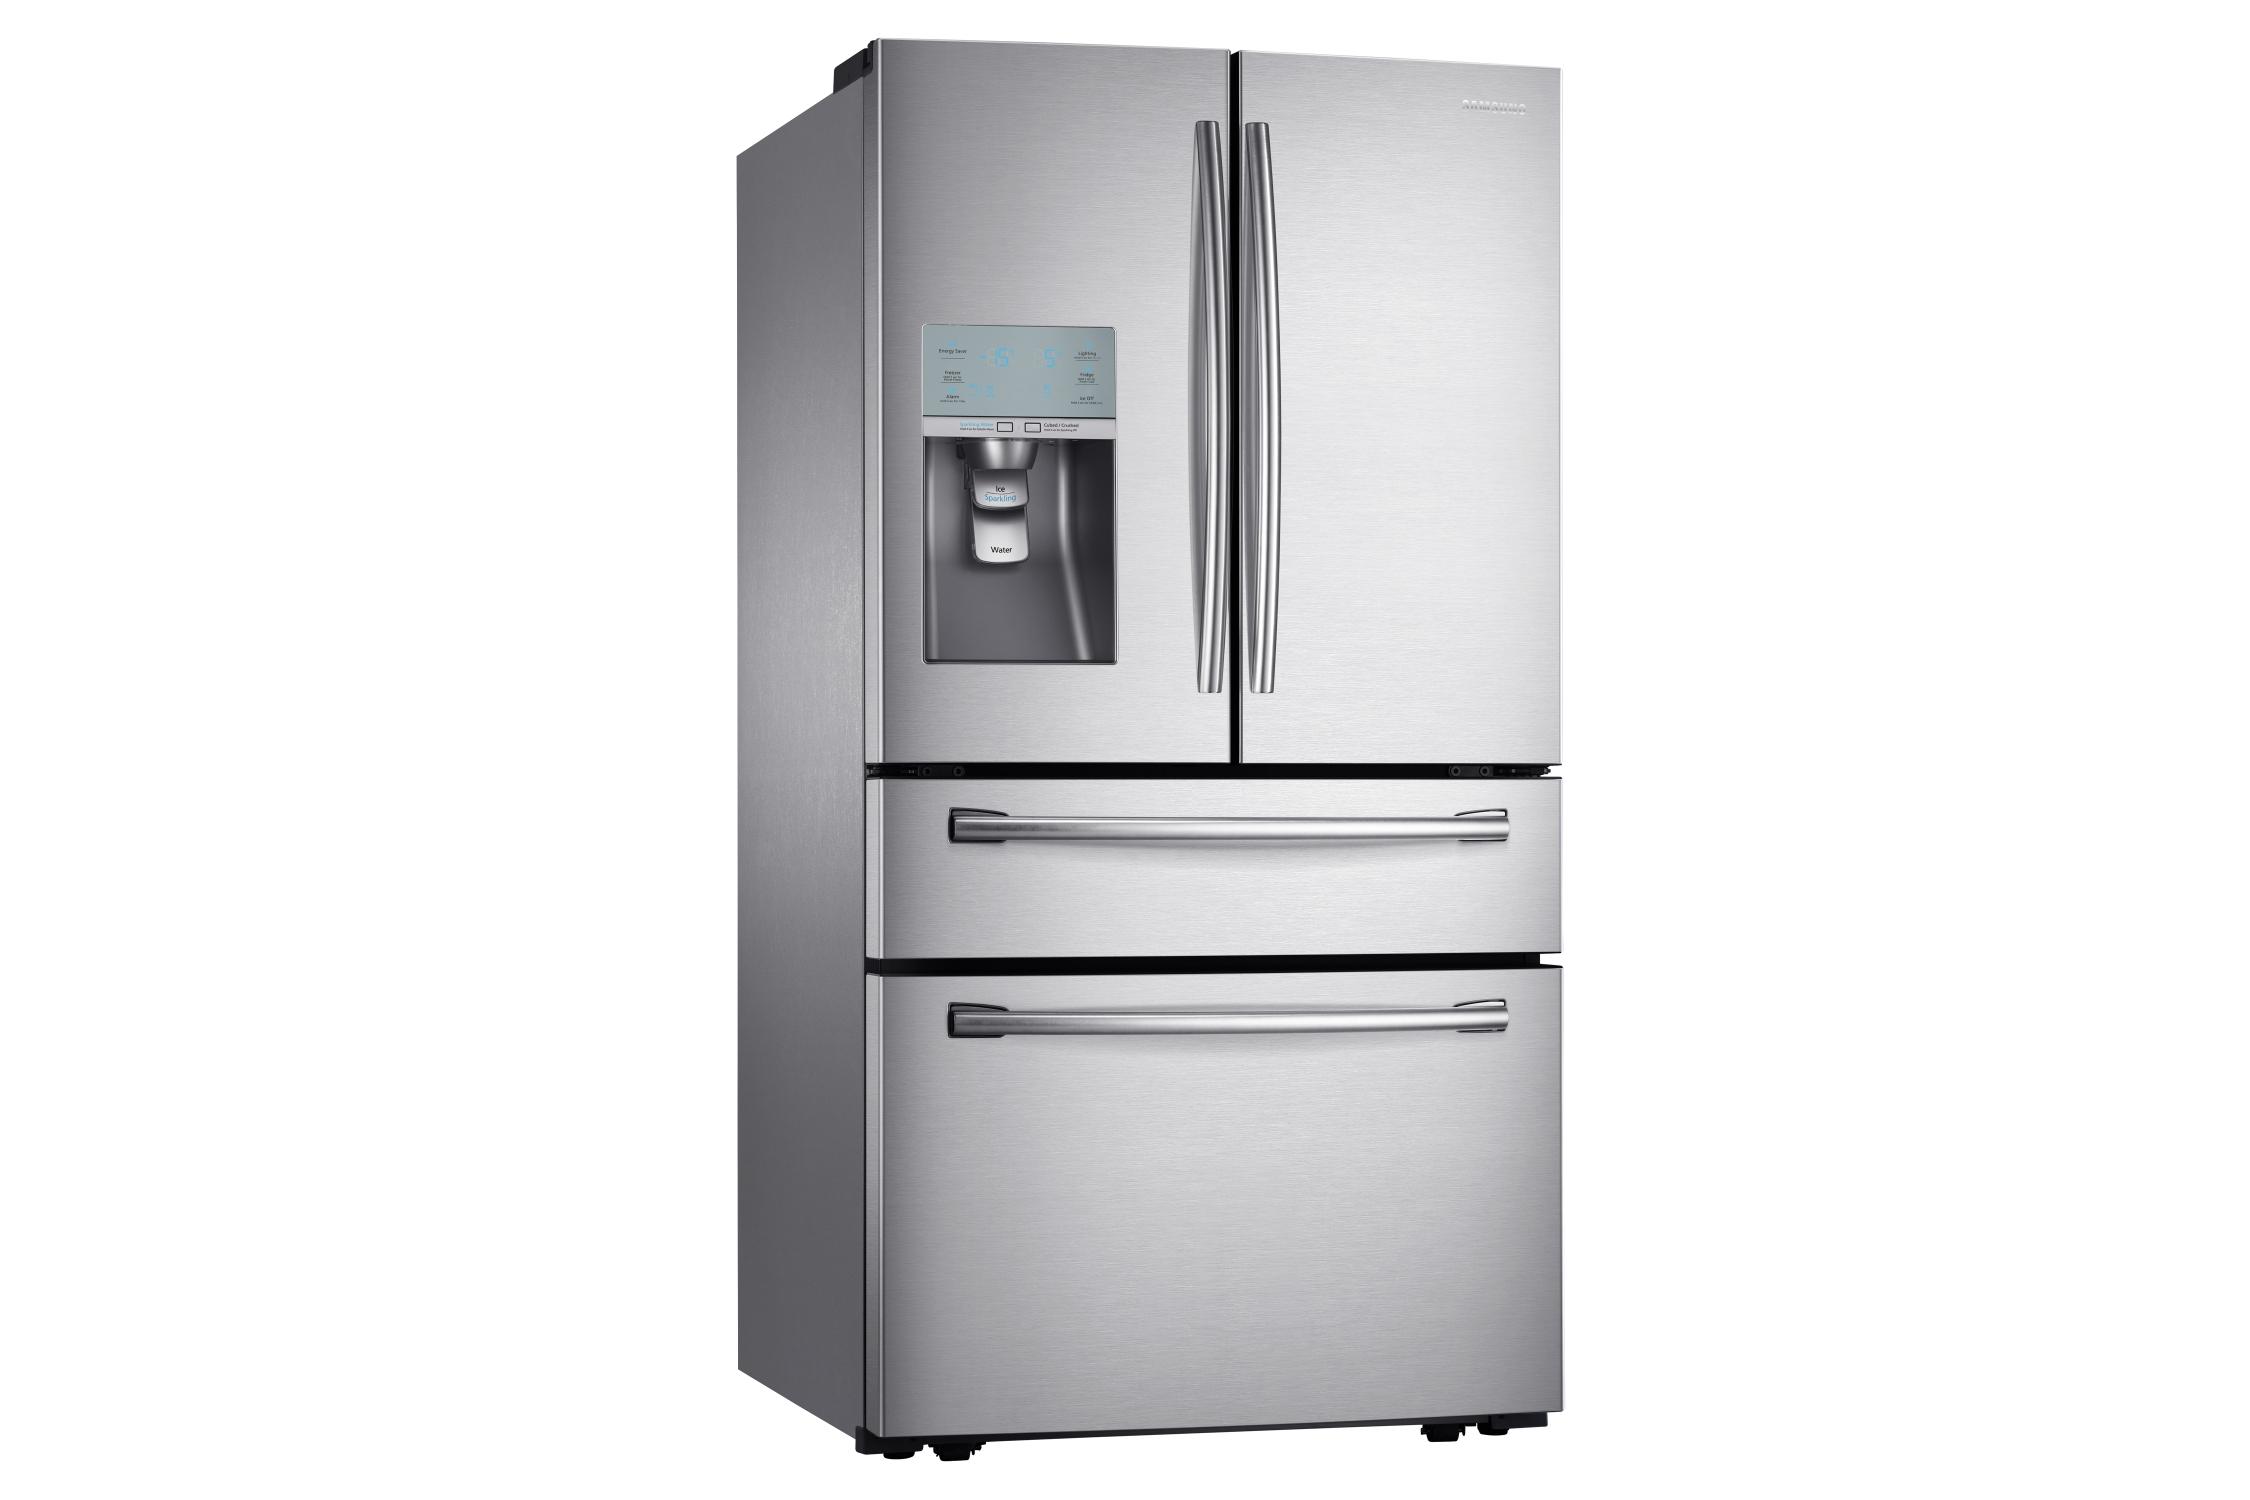 Samsung's soda-dispensing fridge